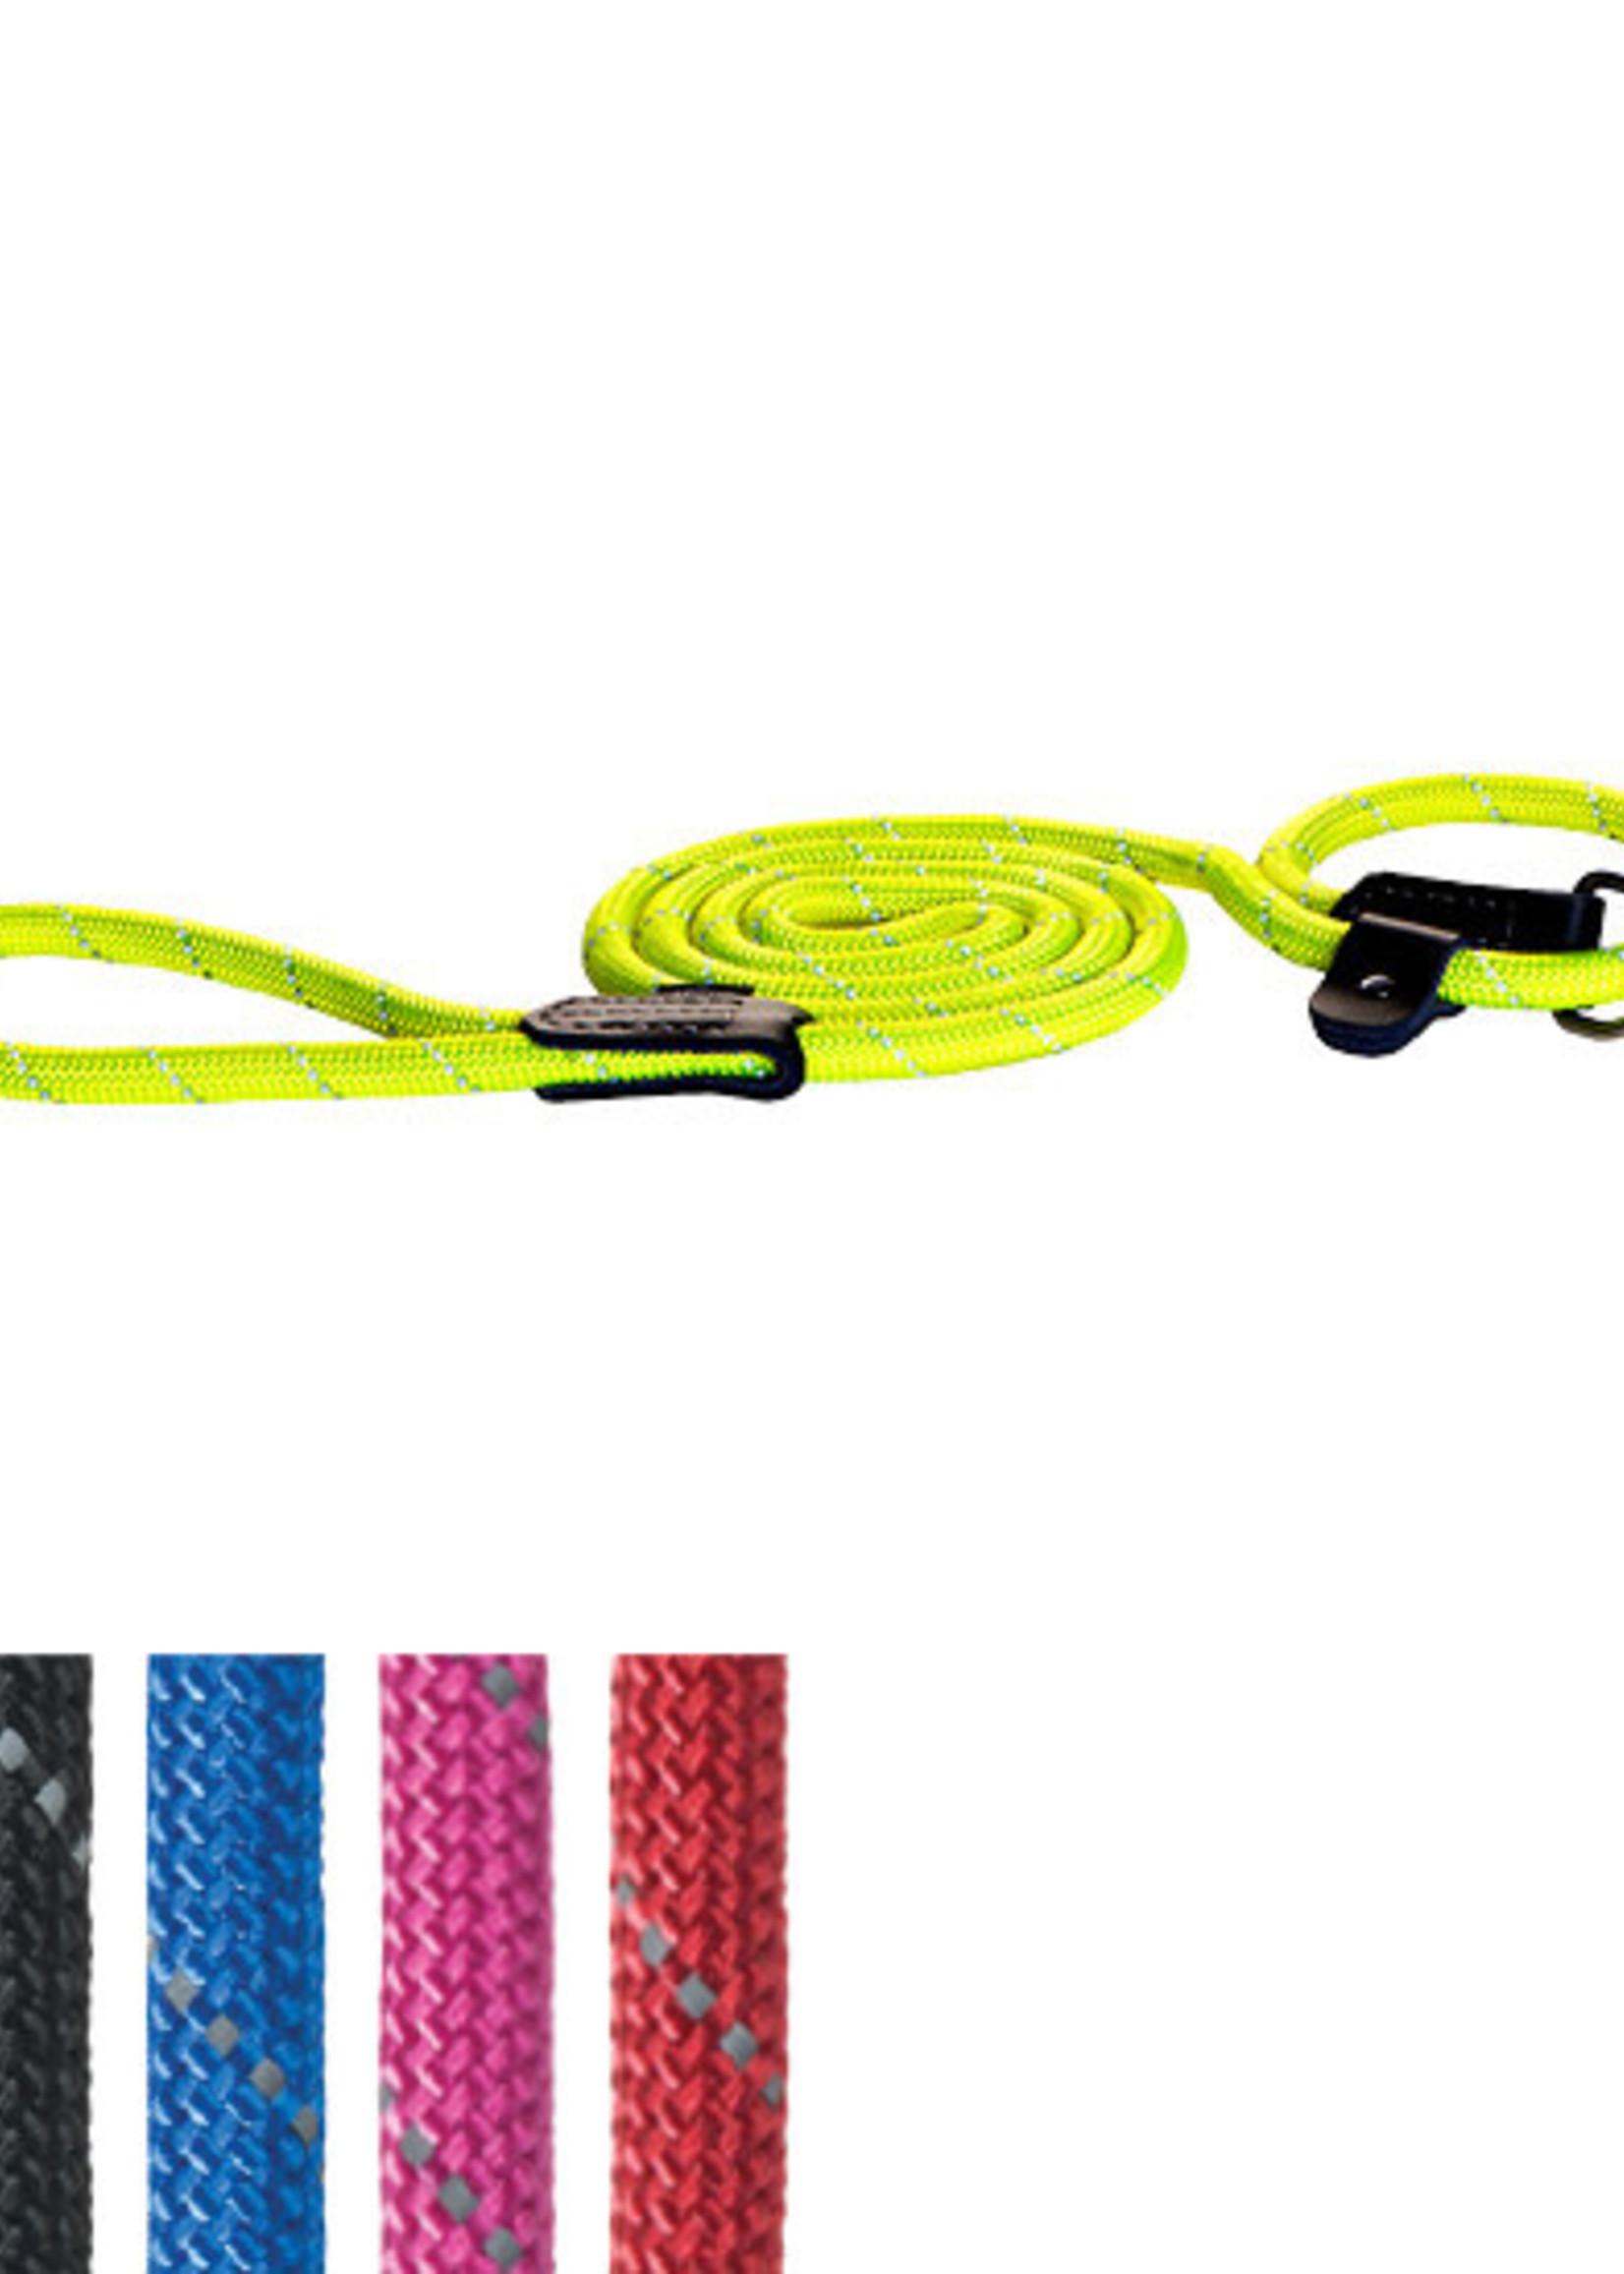 ROGZ Med Rope Moxon Lead Yellow 3/8x6ft